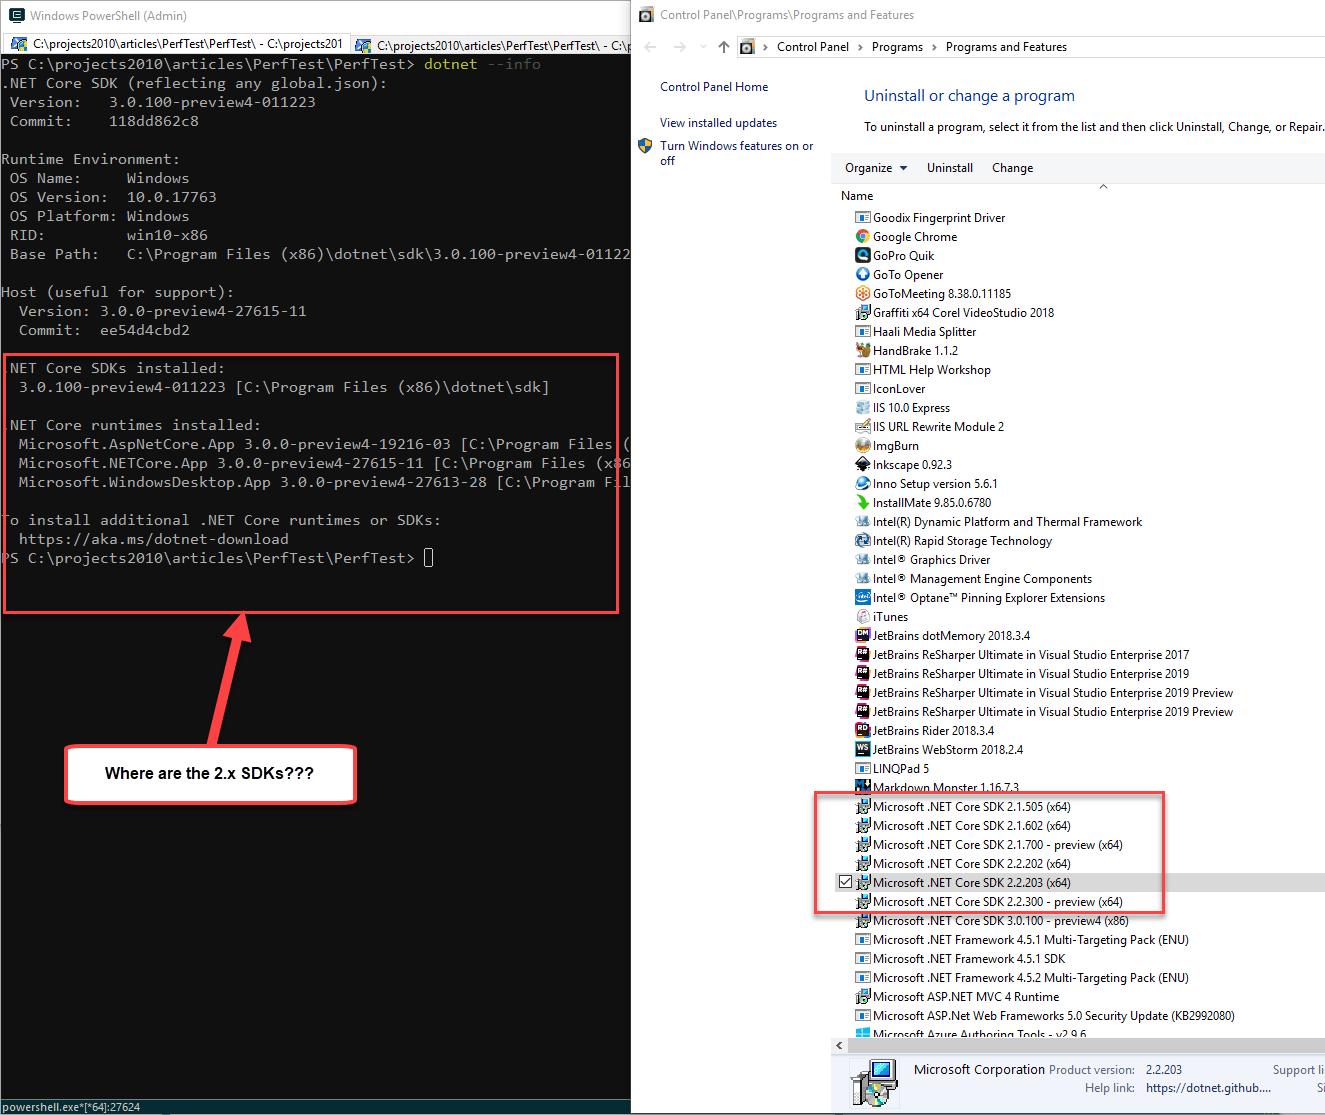 sdk free download for windows 7 64 bit